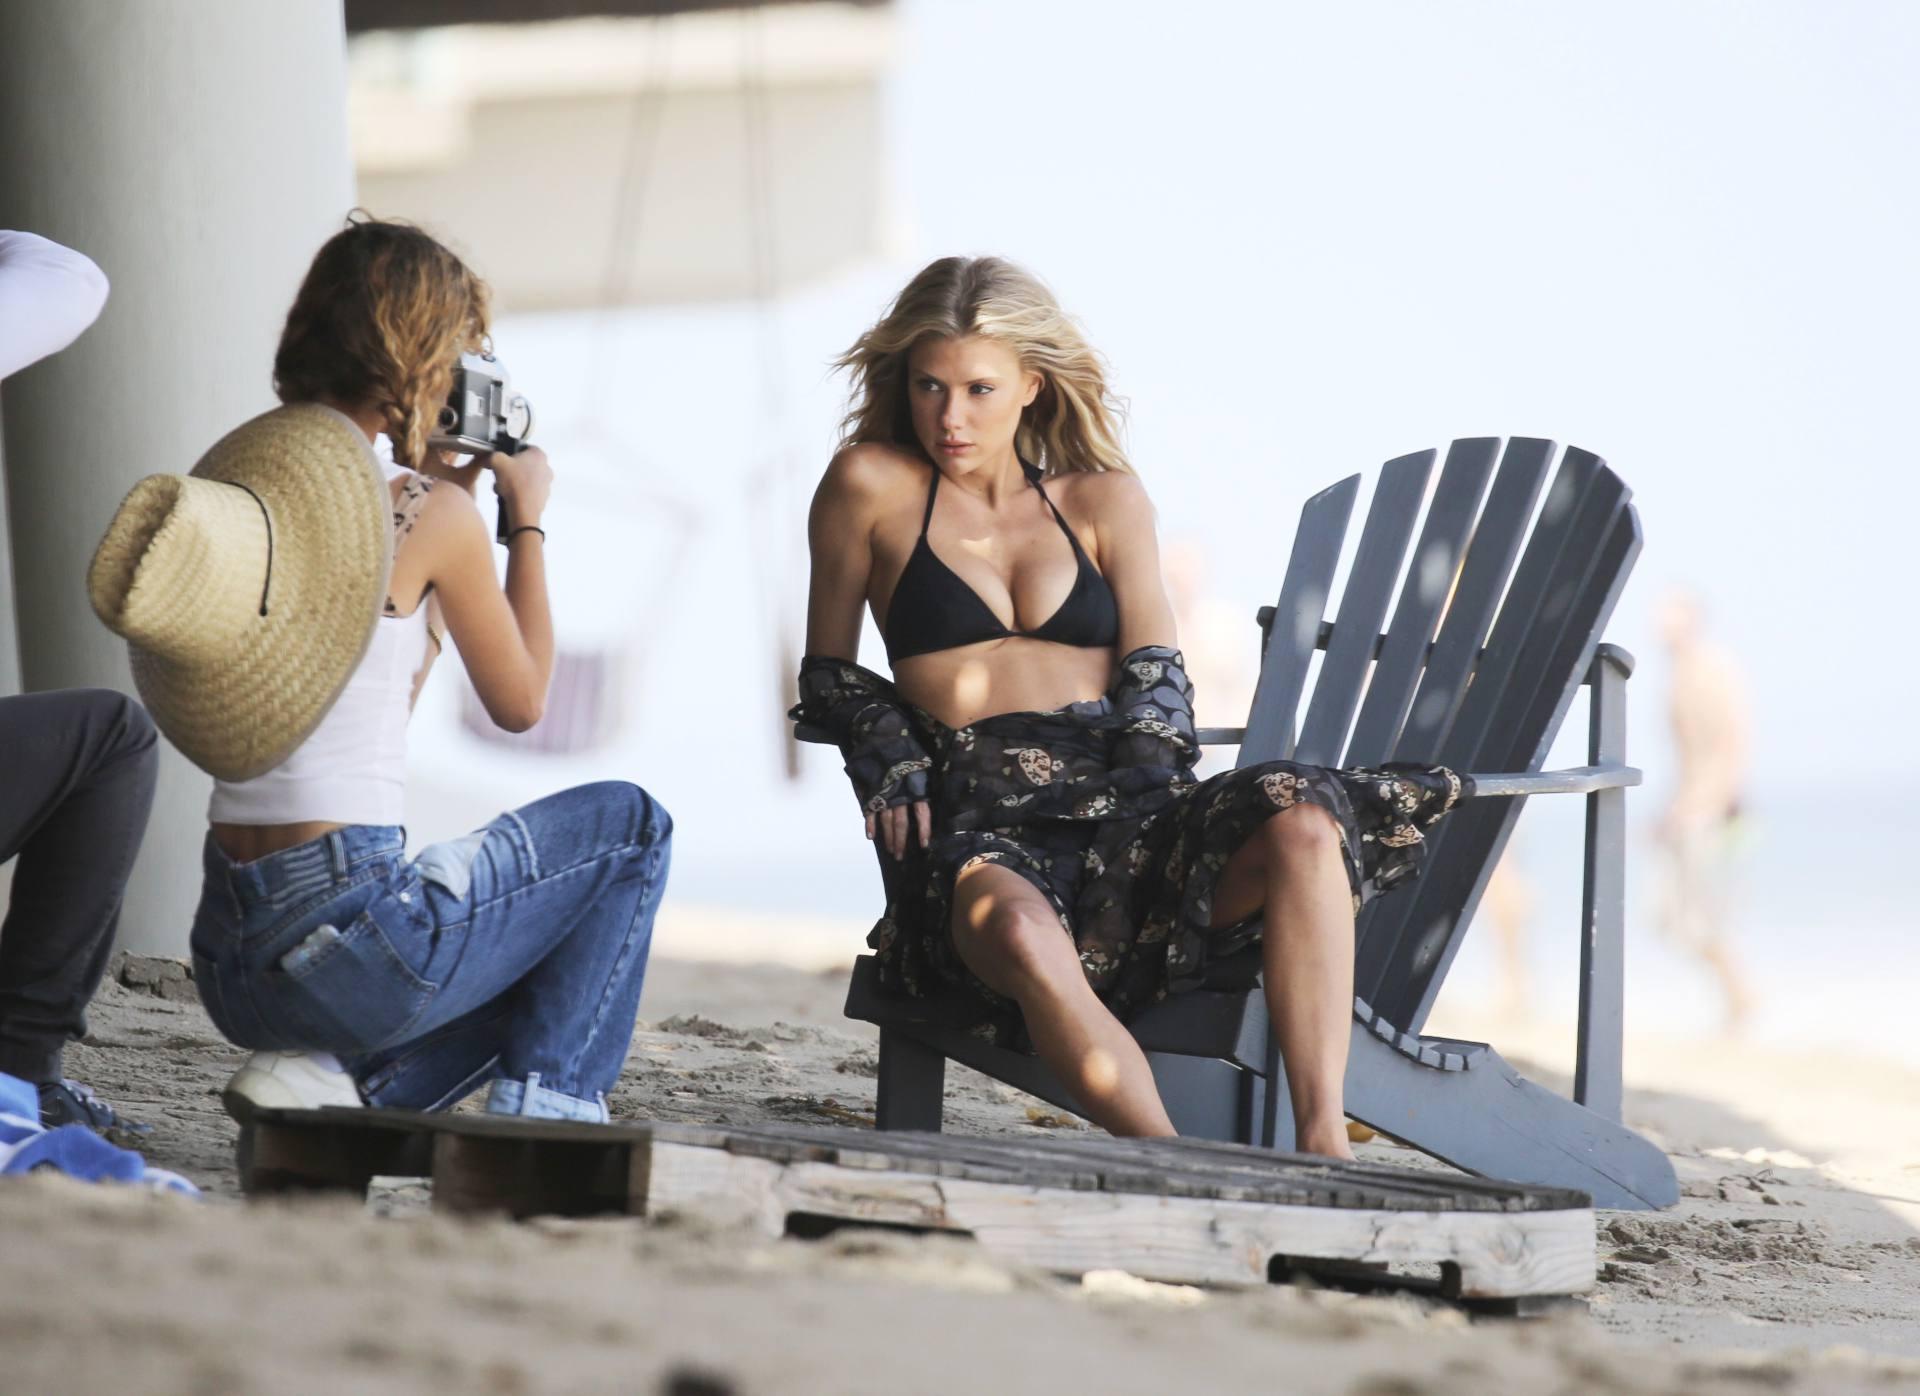 Charlotte Mckinney – Sexy Boobs In Tiny Bikini On The Beach In Los Angeles 0007